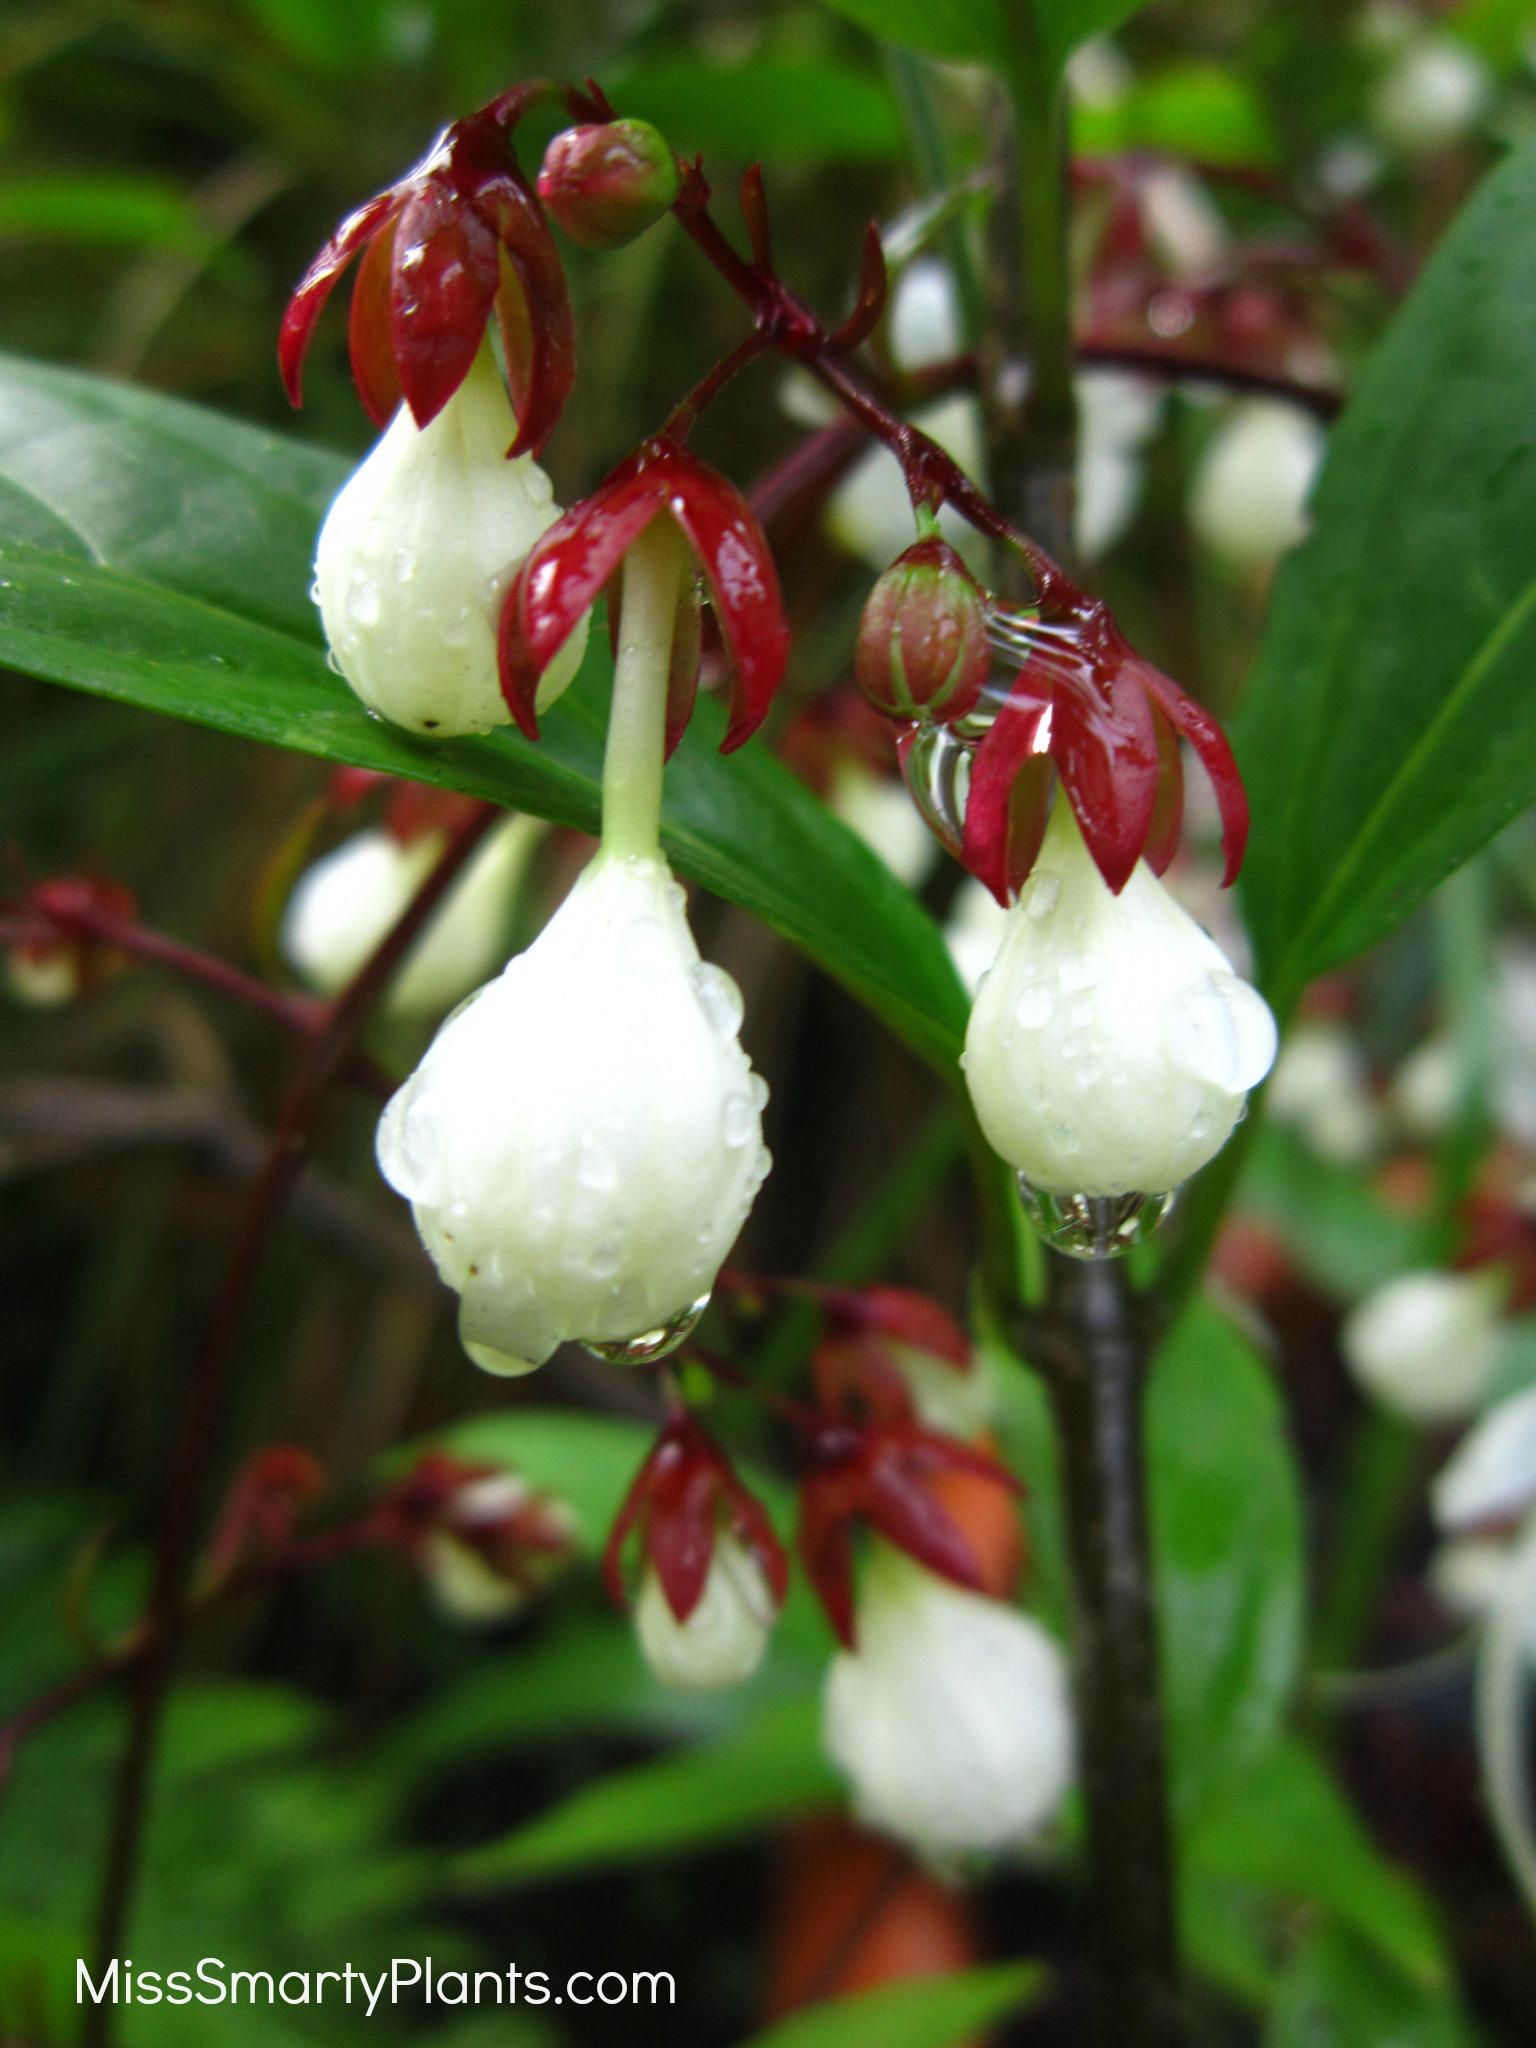 clerodendrum for florida miss smarty plants. Black Bedroom Furniture Sets. Home Design Ideas